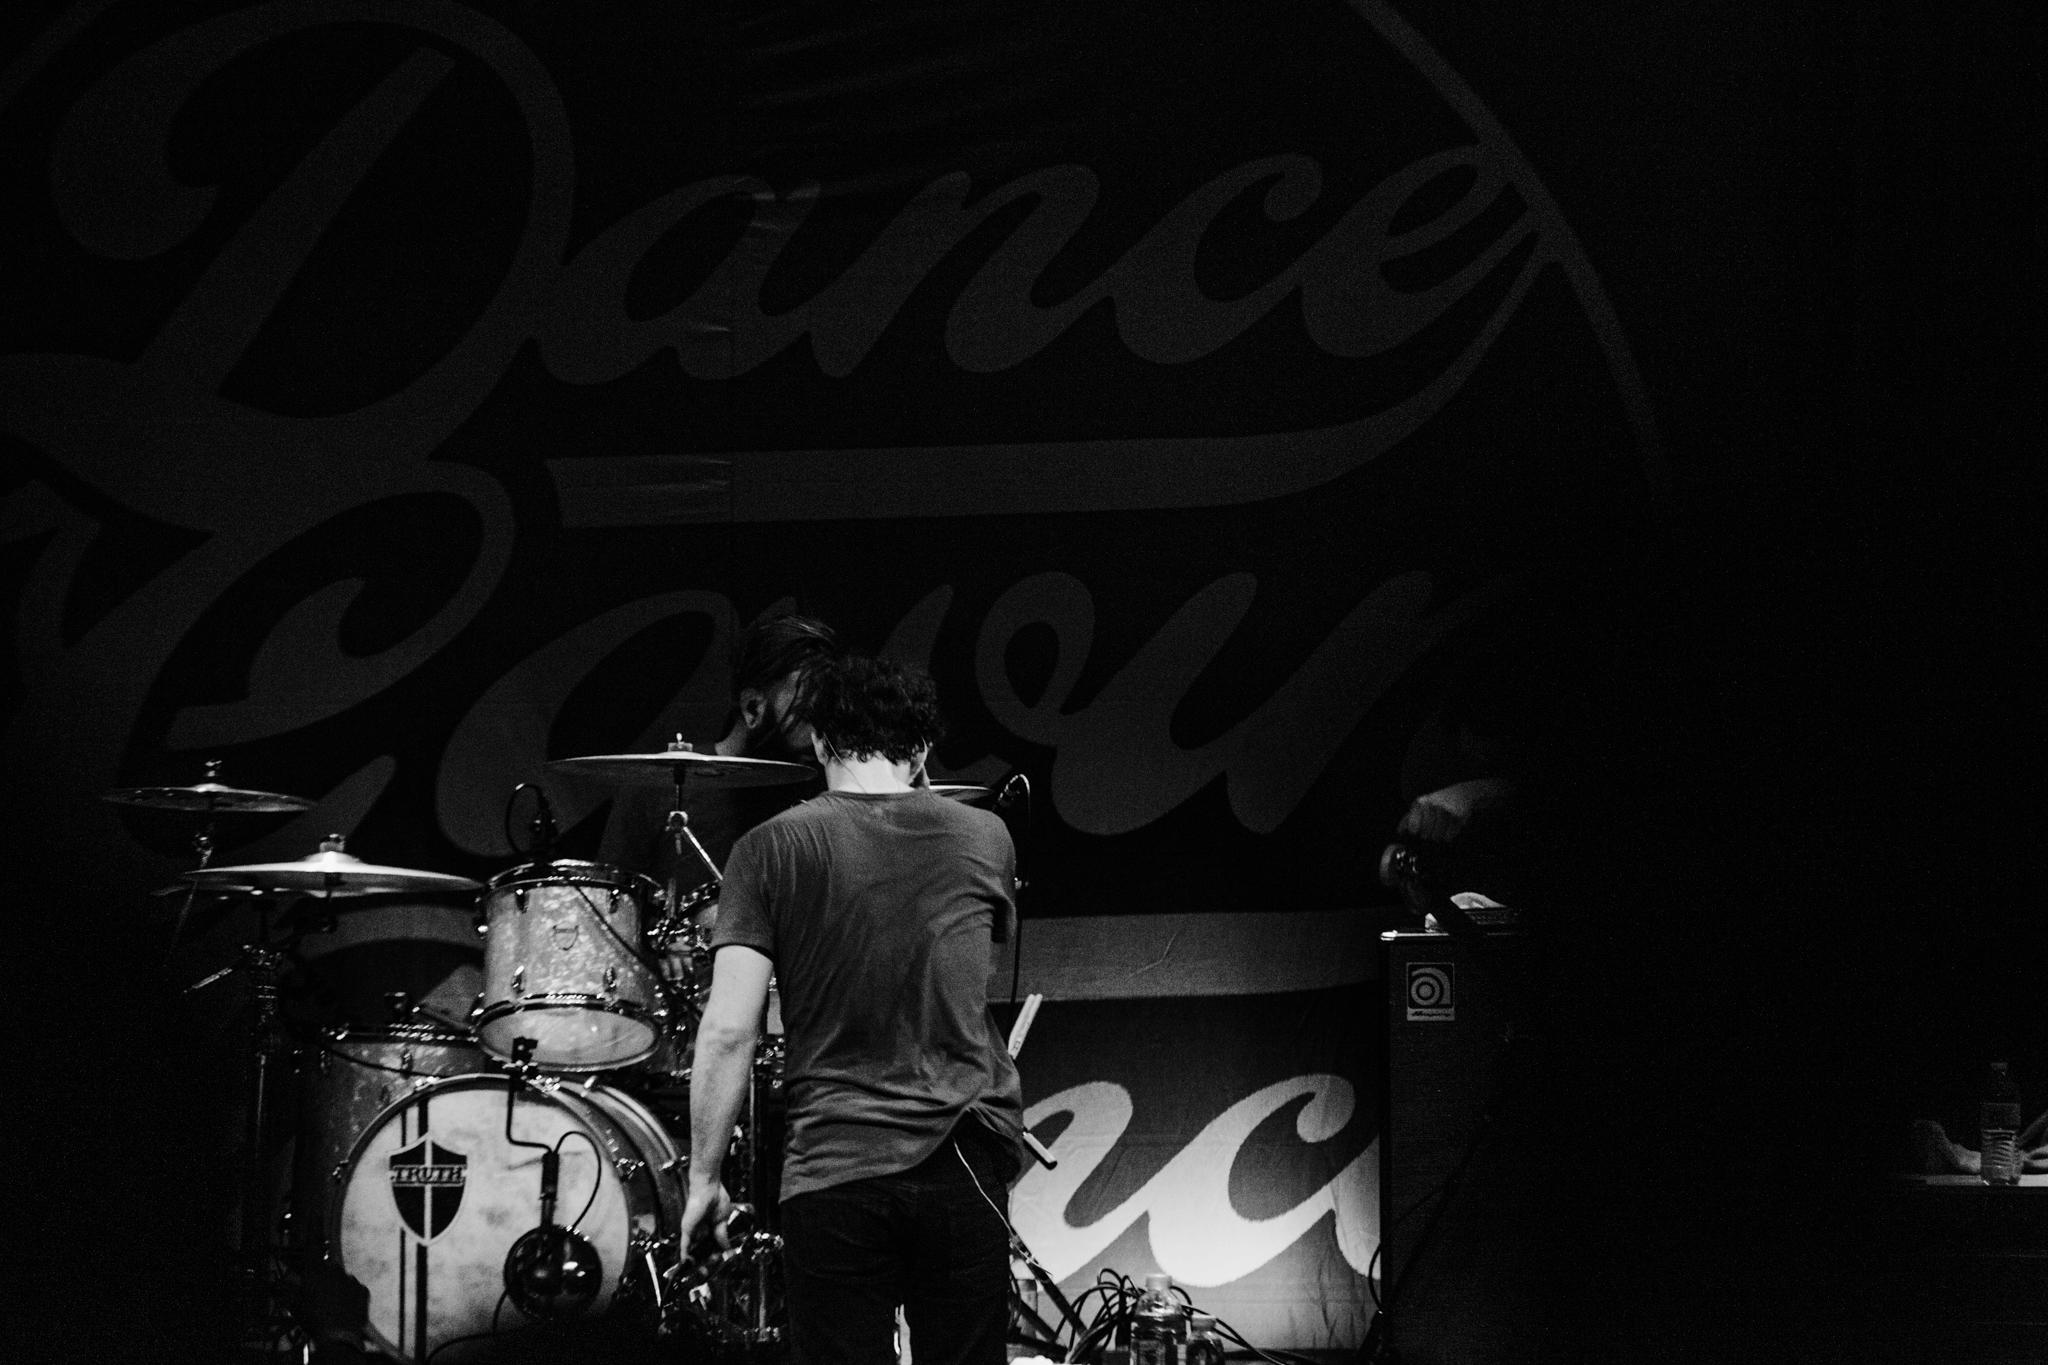 Lafferty Photo - Dance Gavin Dance 03.08.17-8554.jpg